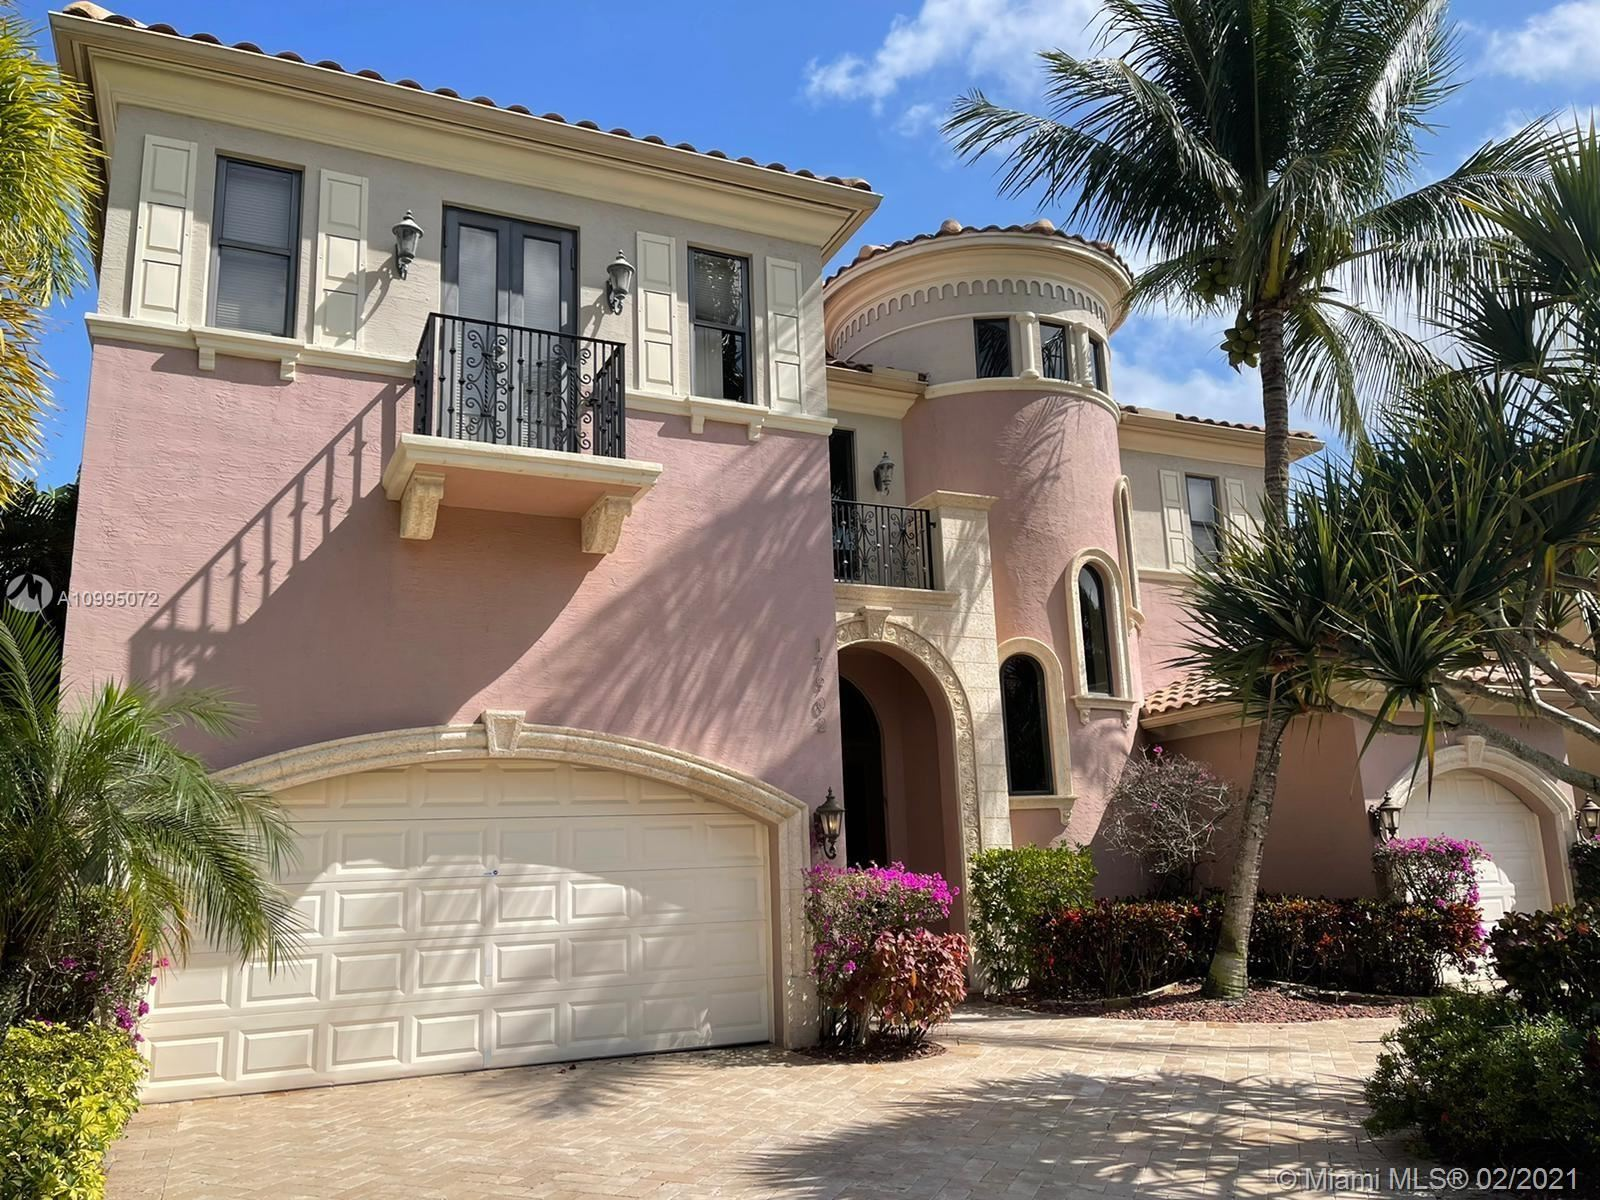 17902 Monte Vista Dr, Boca Raton, FL 33496 - #: A10995072